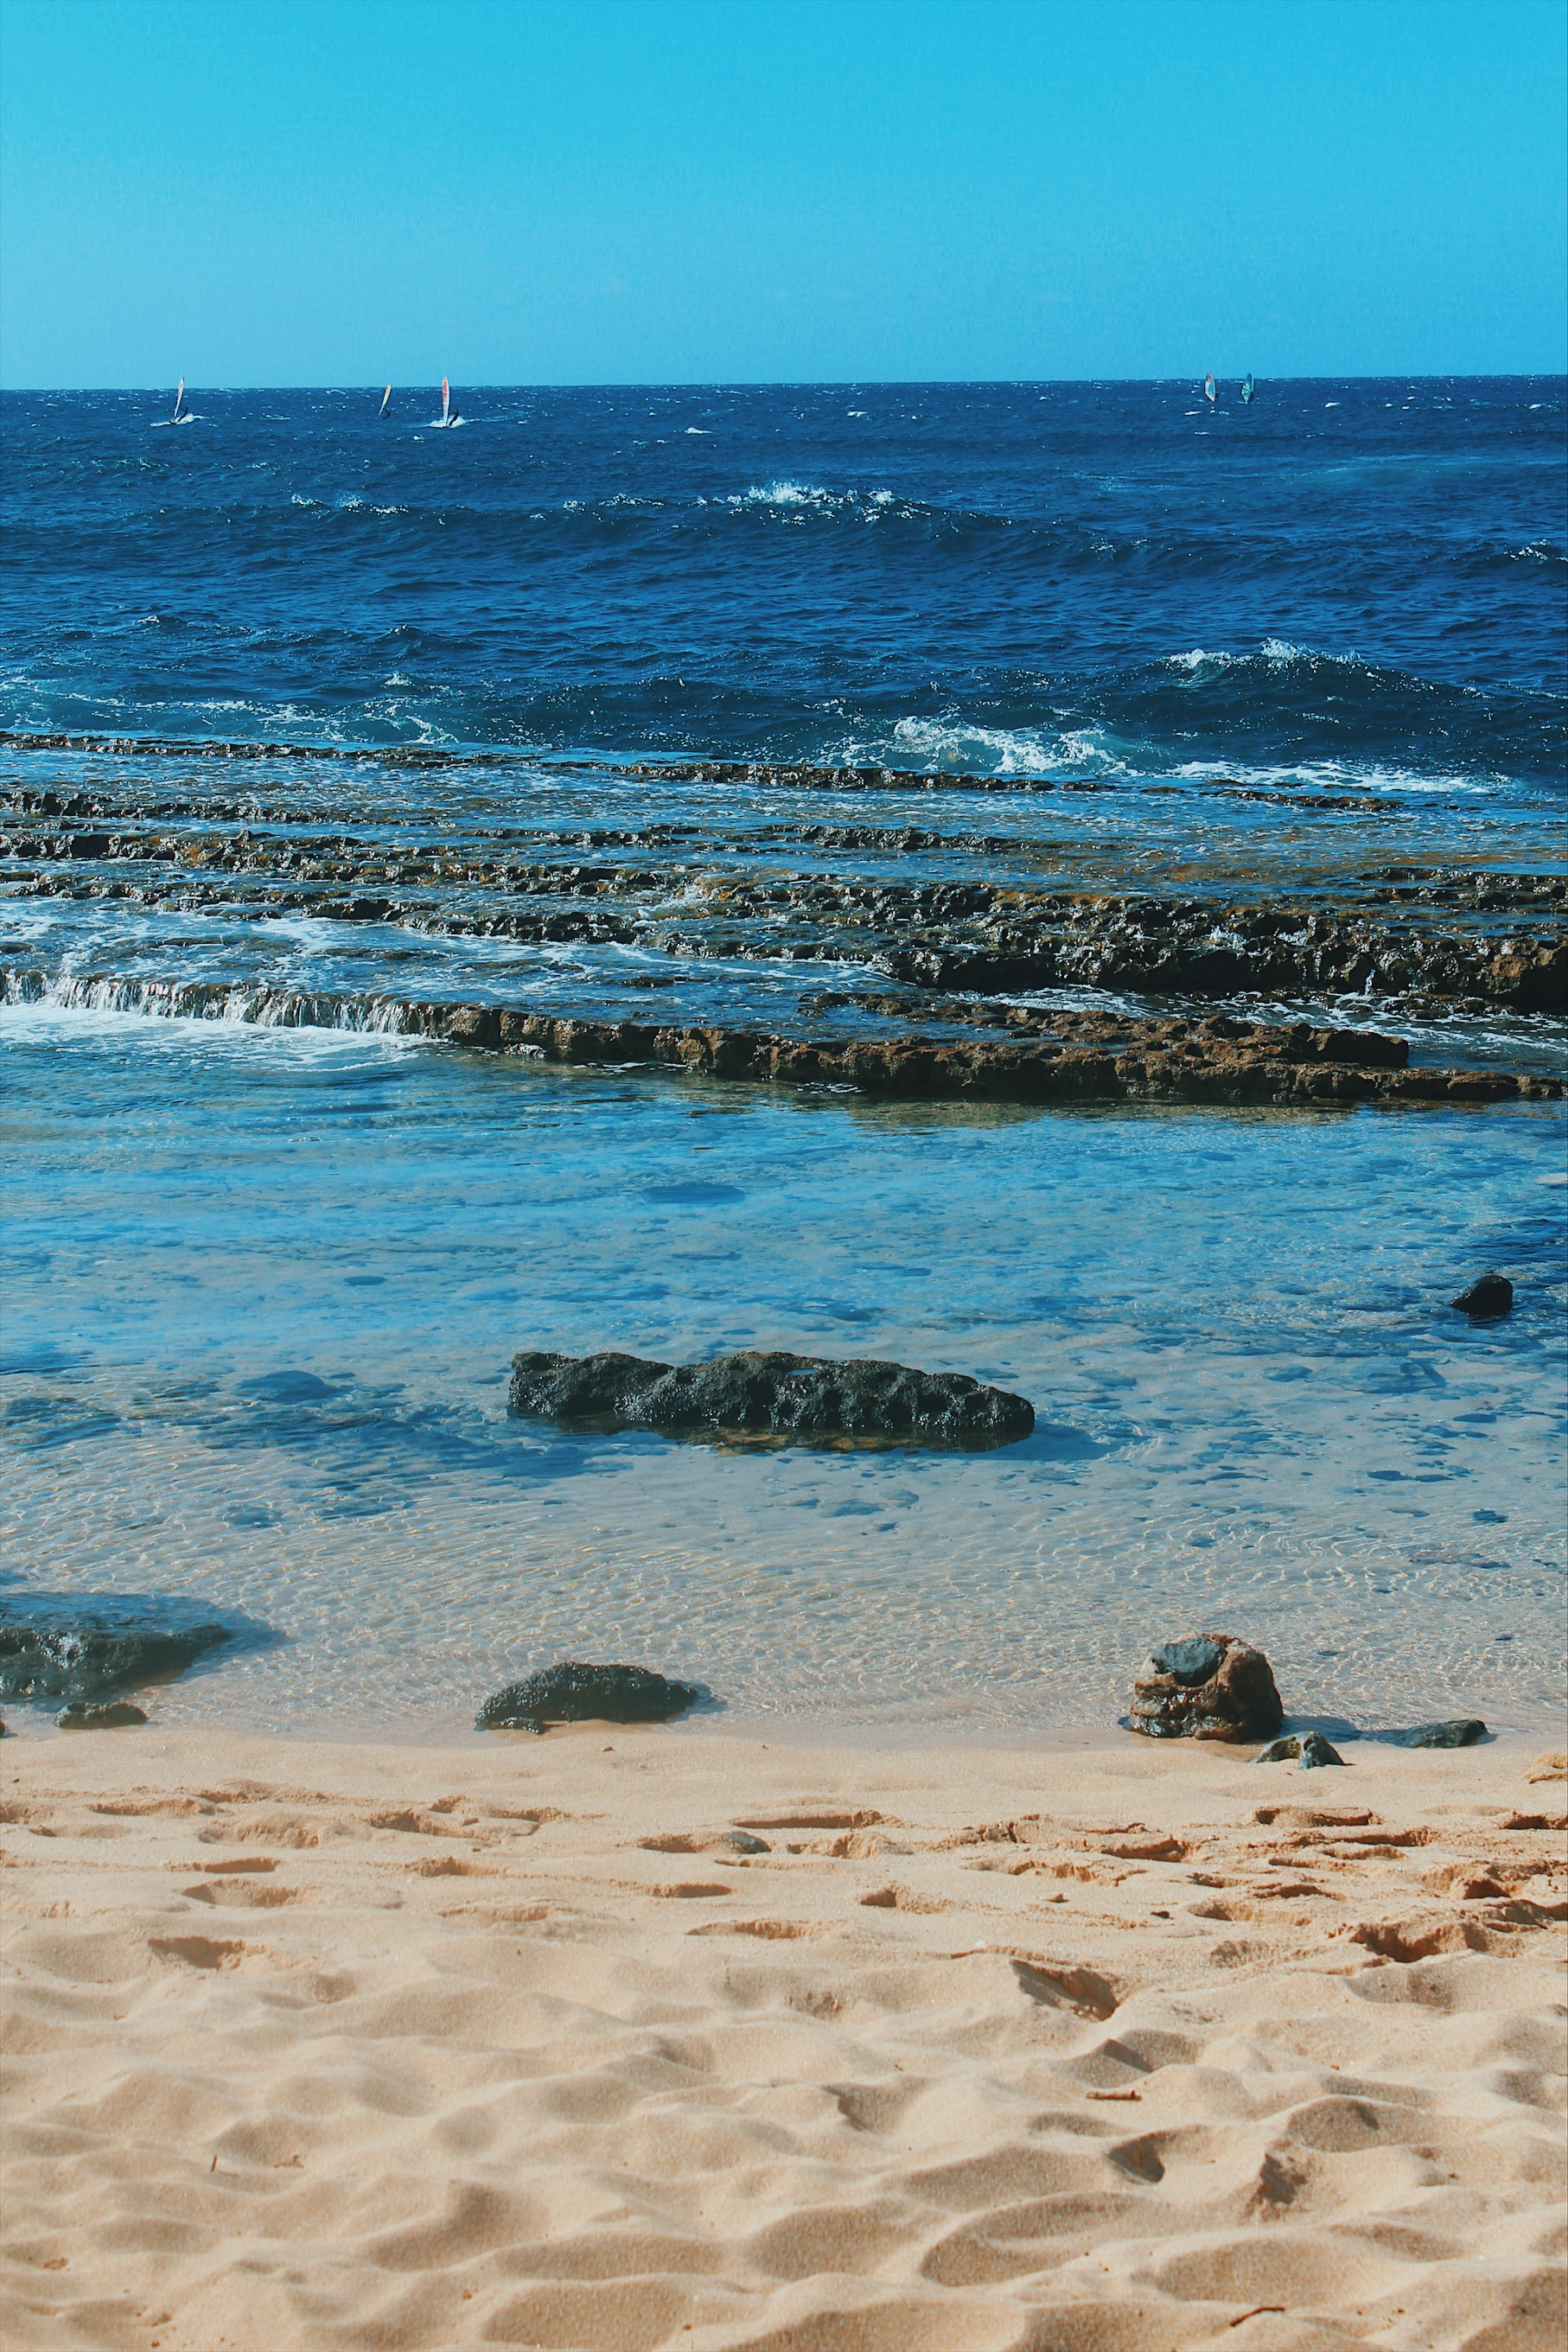 Hoʻokipa Beach - PearlMargaret.com